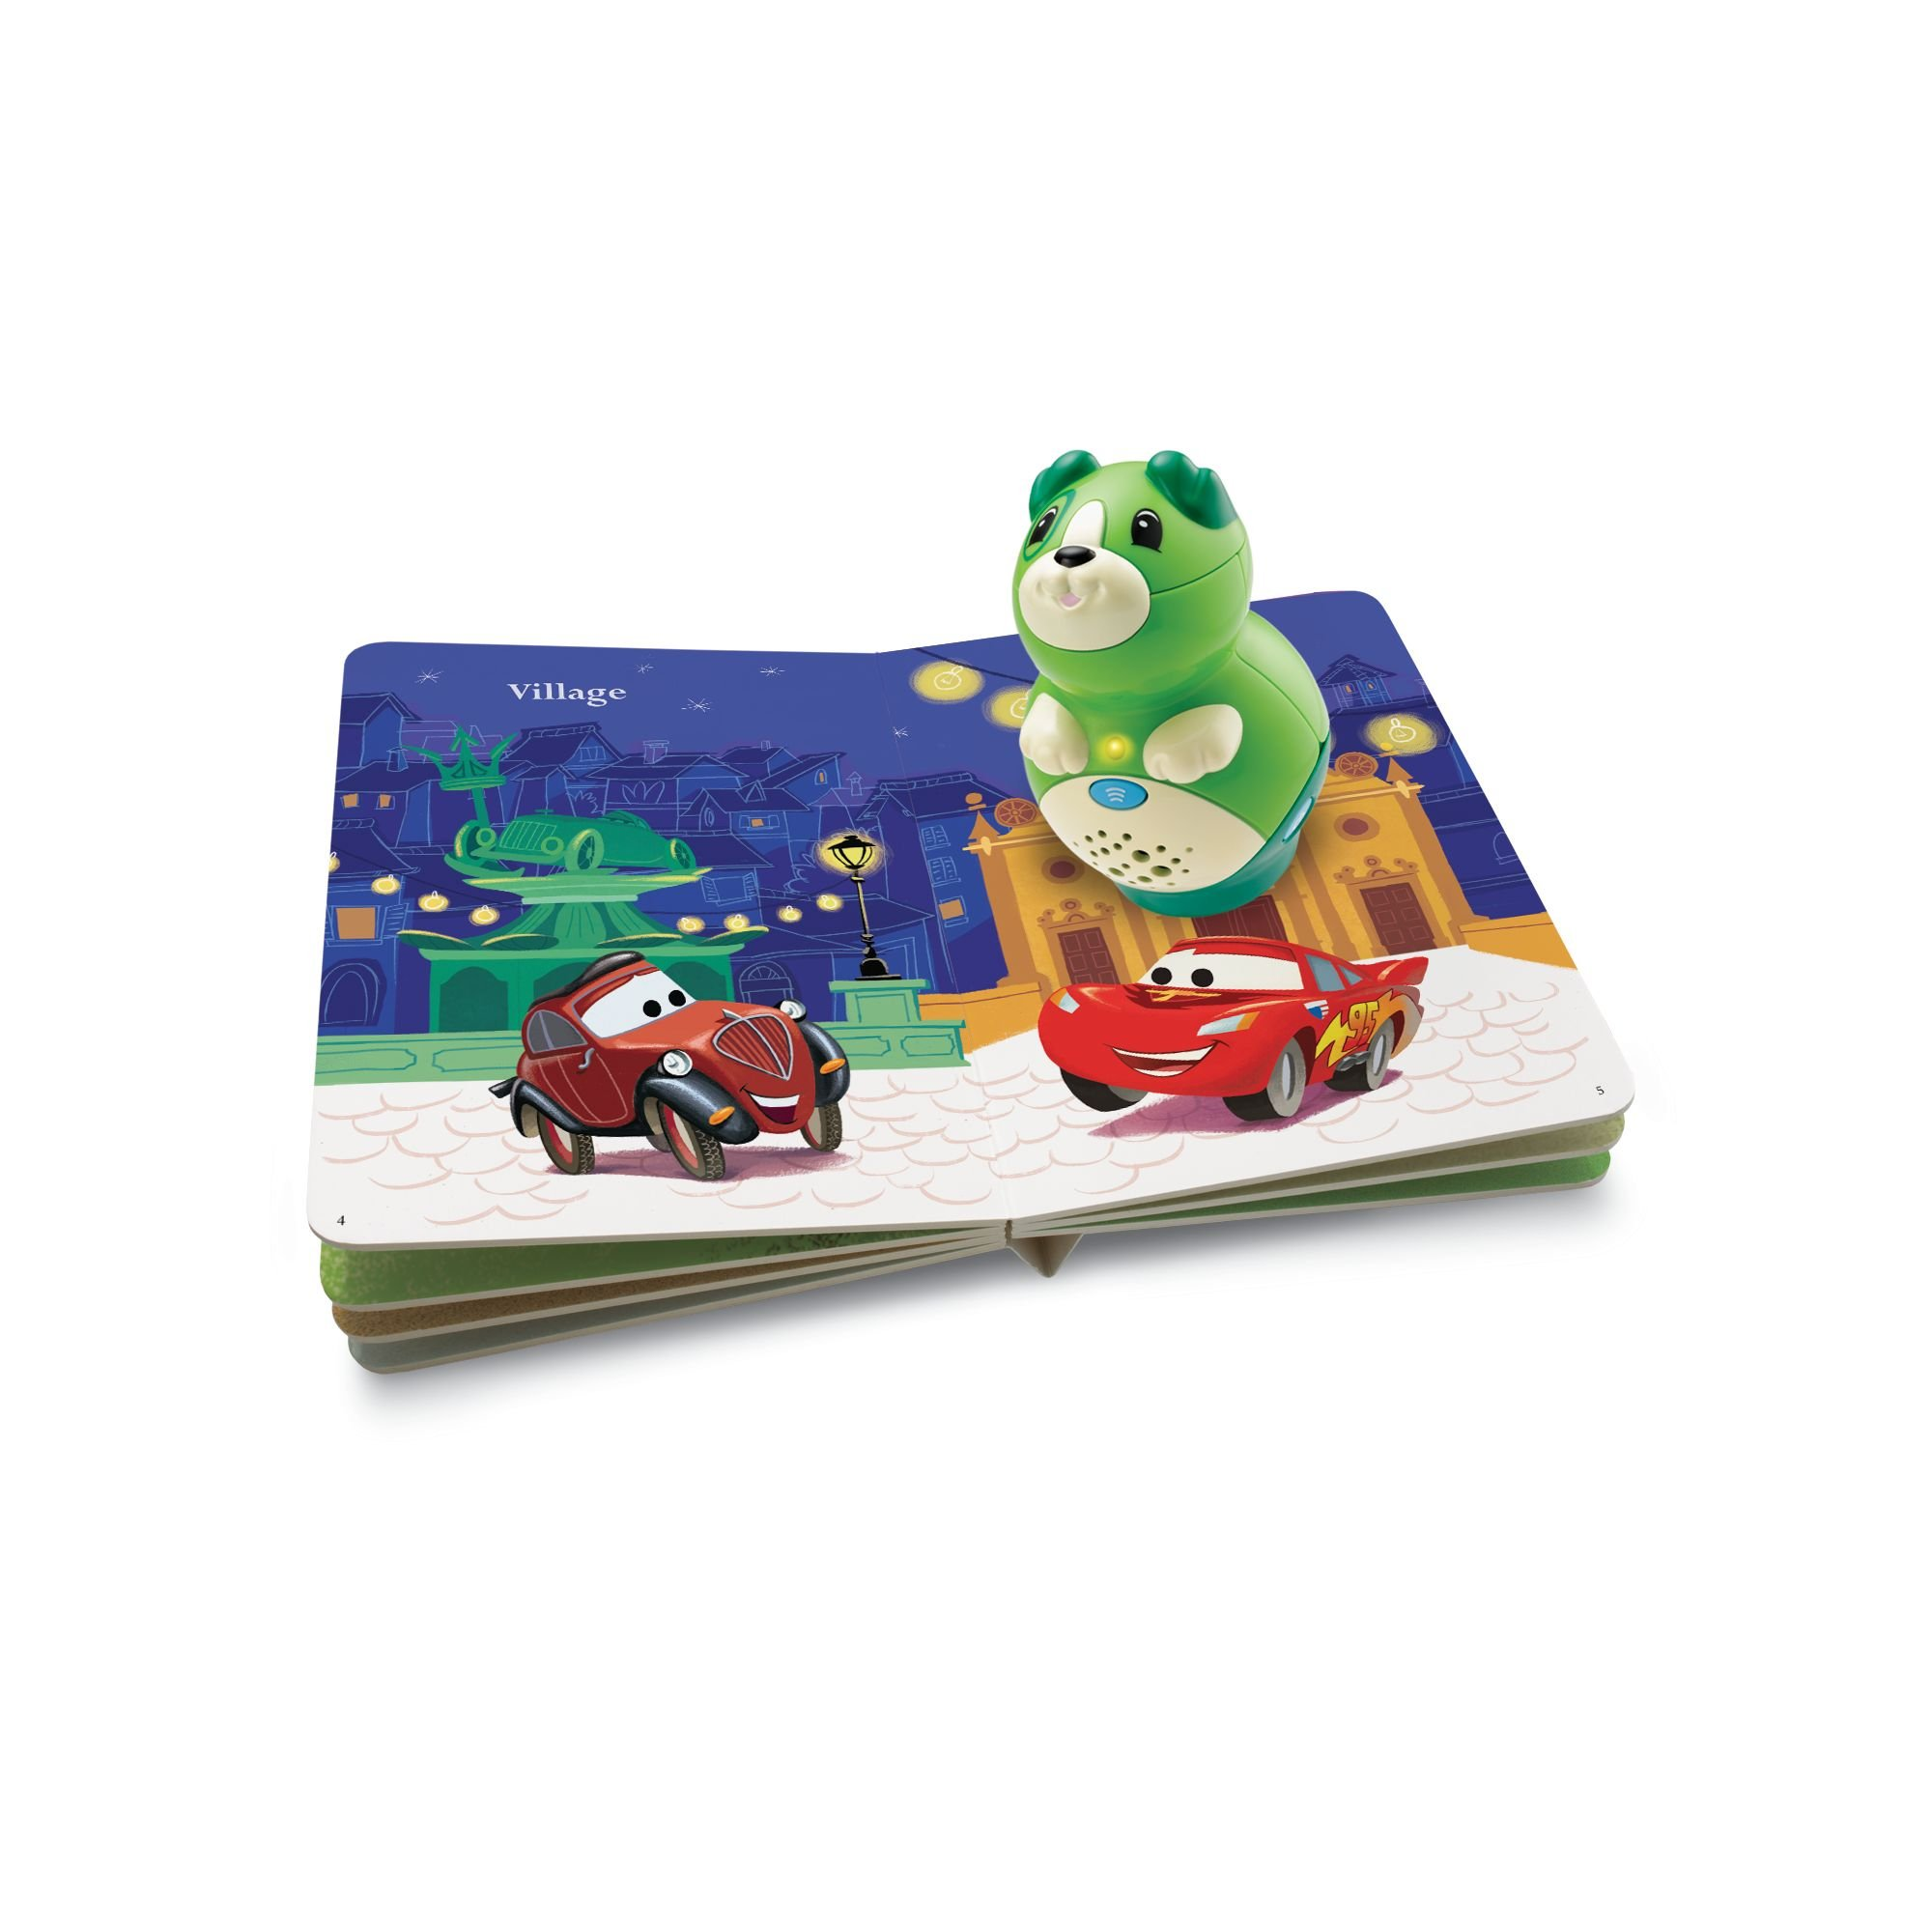 Leapfrog LeapReader Junior Book: DisneyPixar Cars 2: World Adventure (works with Tag Junior) by LeapFrog (Image #2)